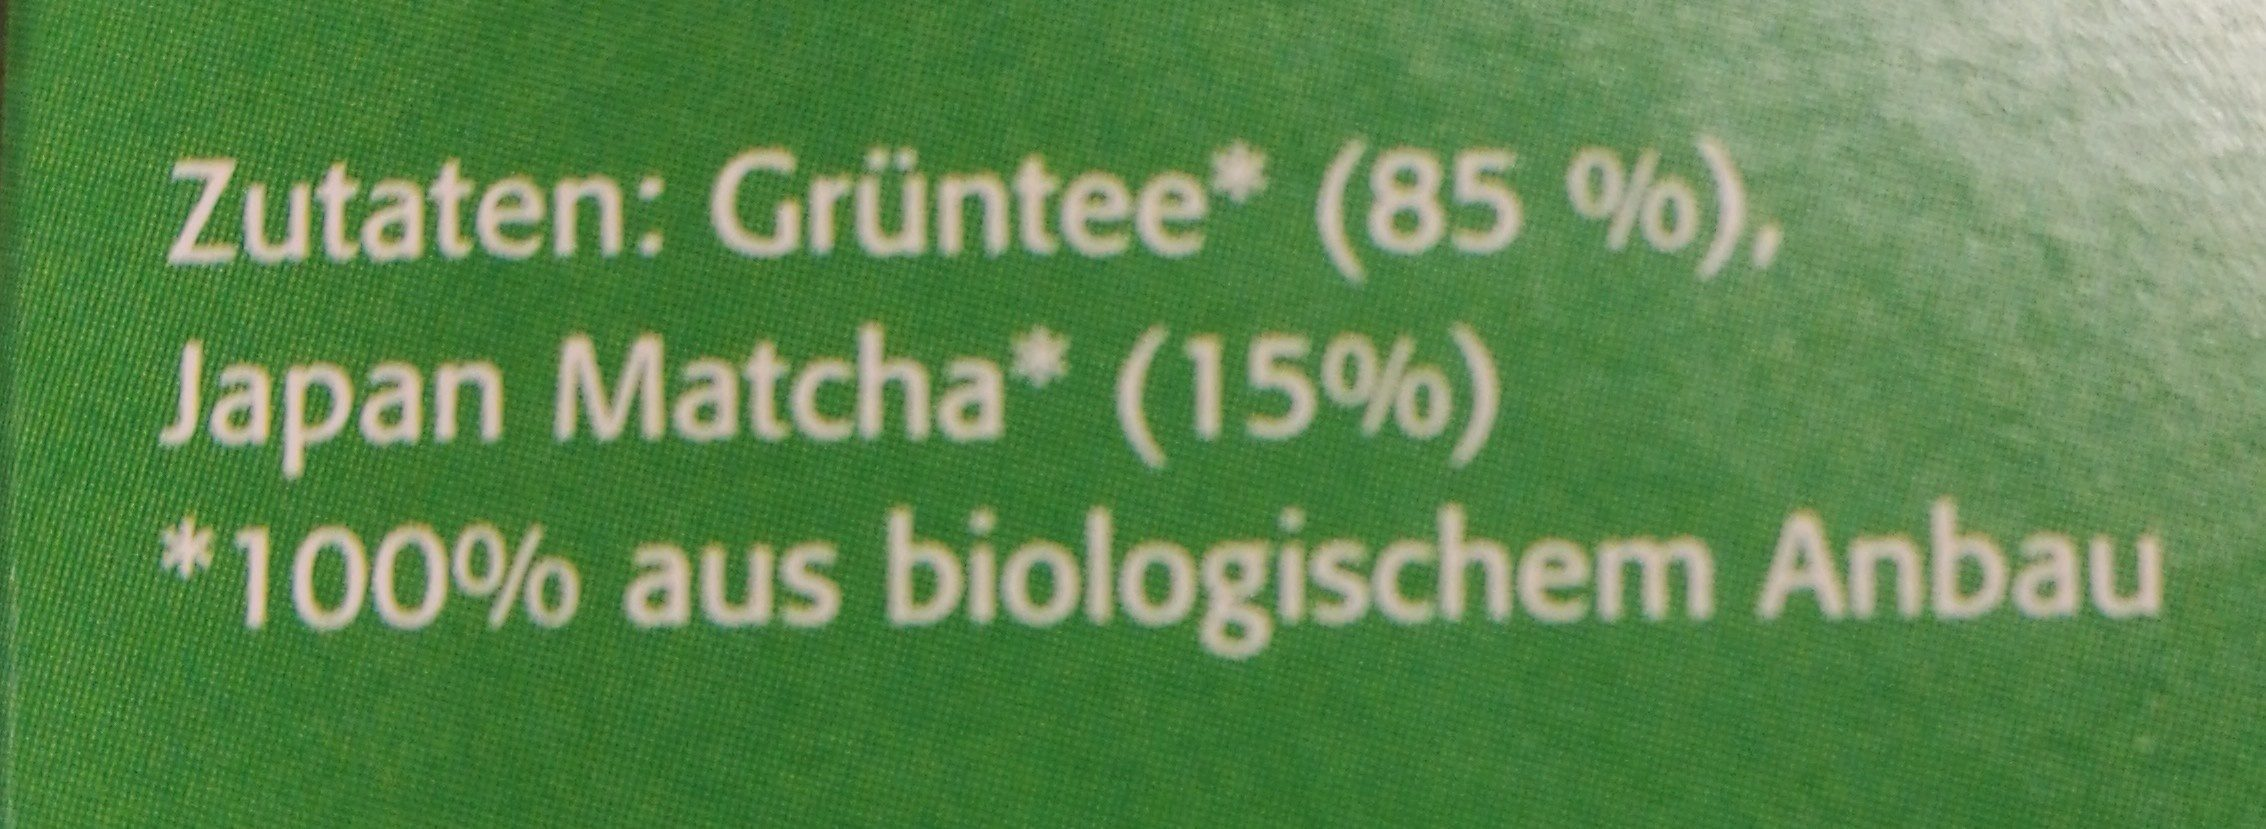 Grüntee &matcha - Ingredients